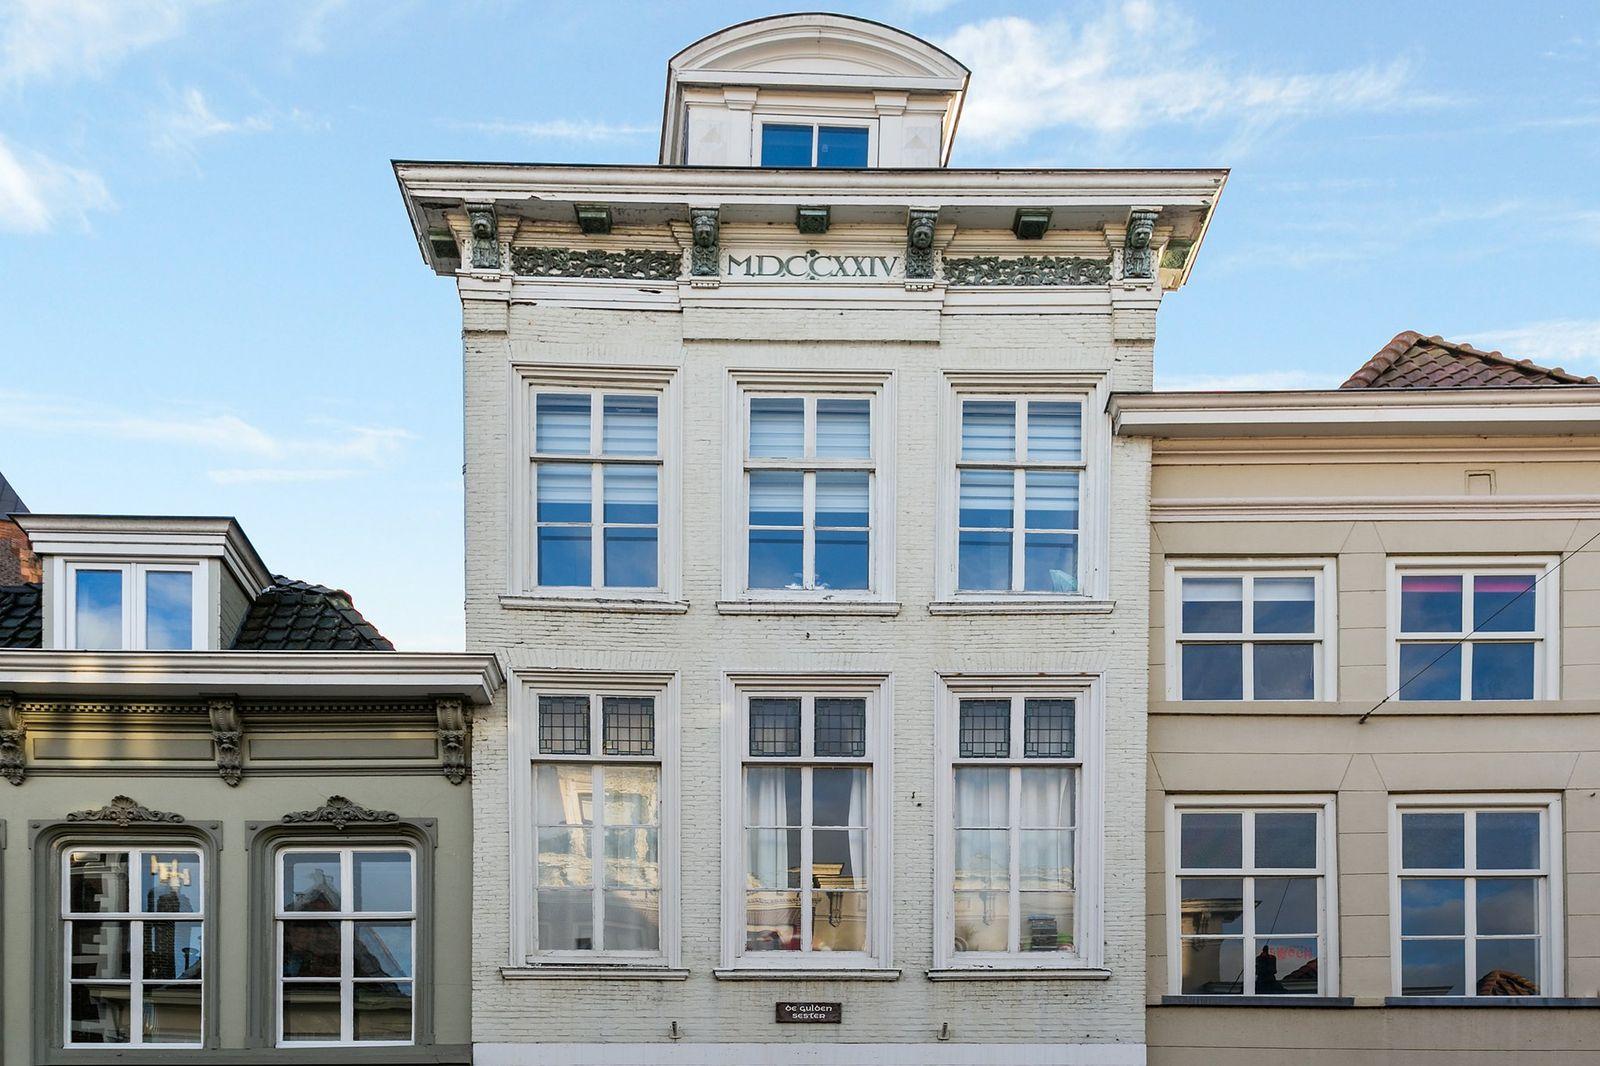 Hinthamerstraat 159-b, 's-hertogenbosch